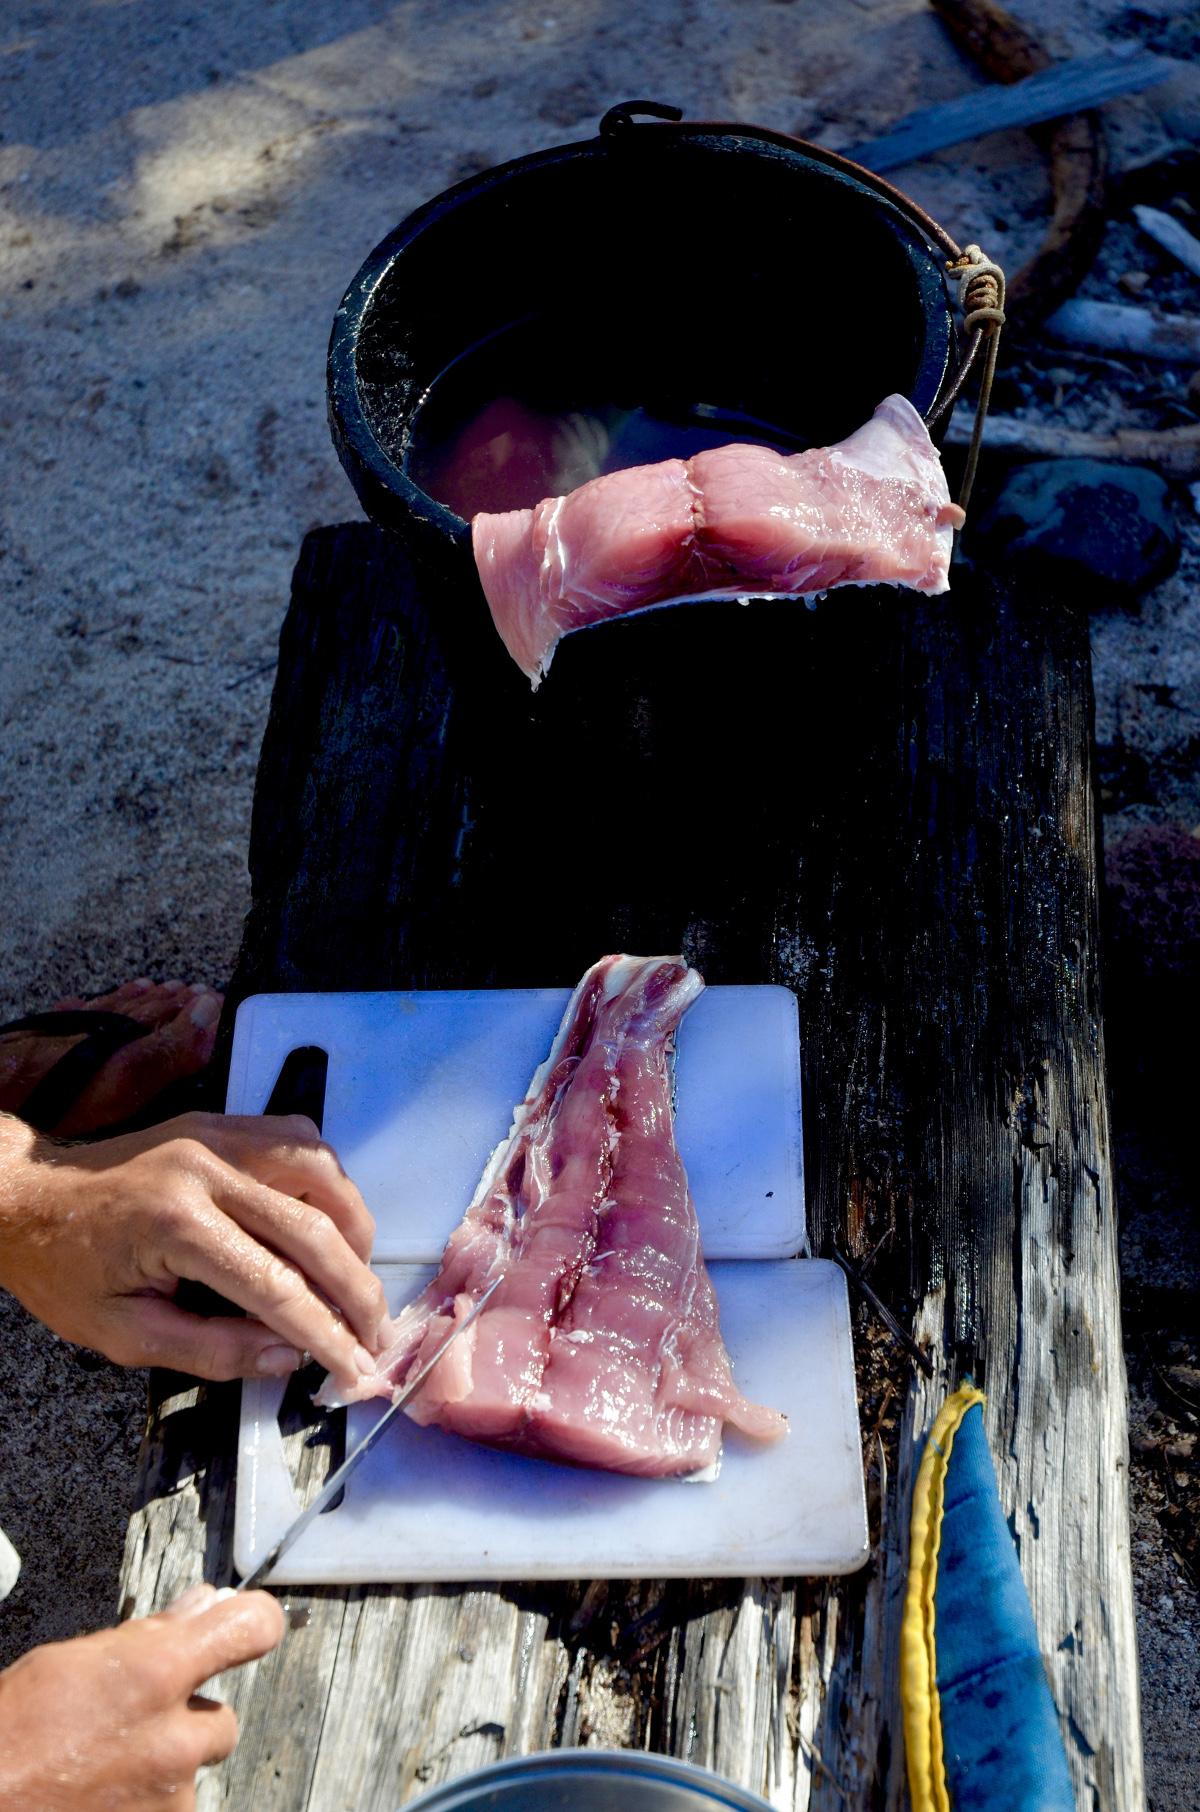 Preparing fresh fish